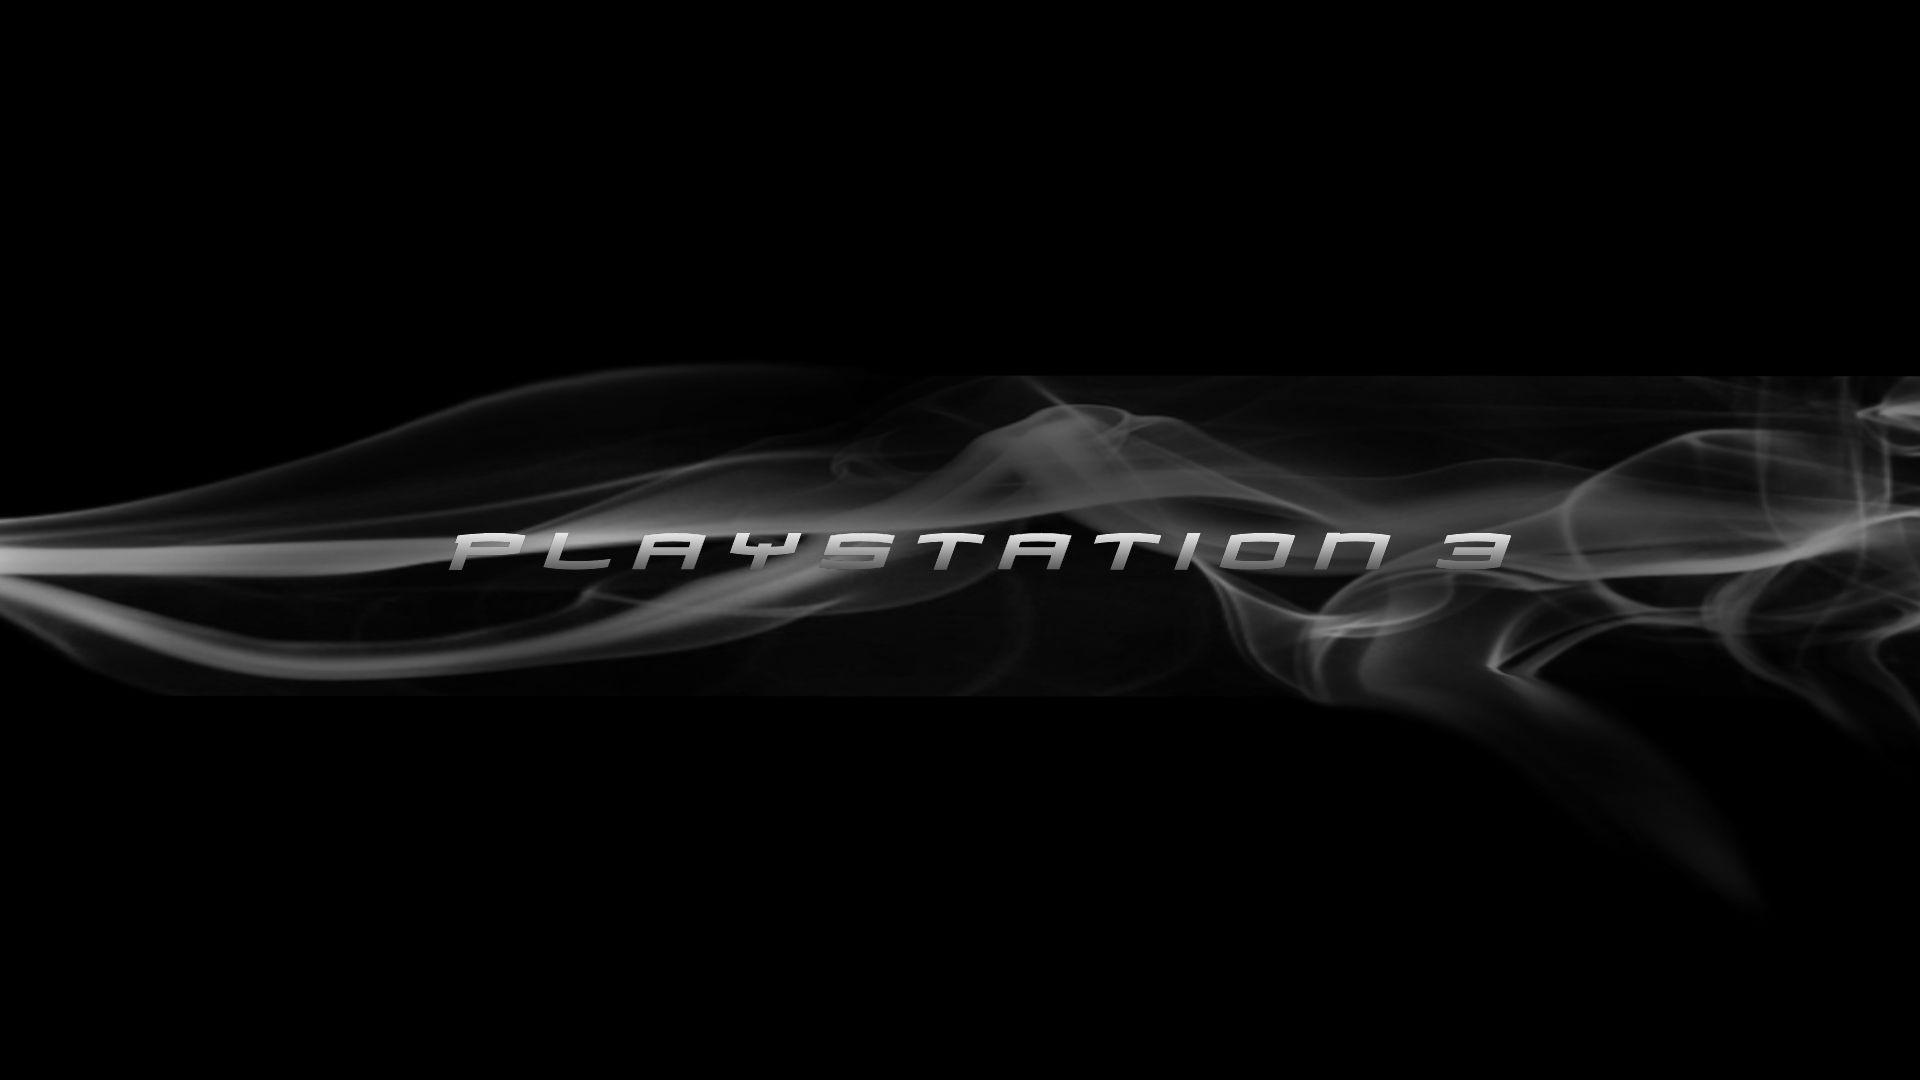 Playstation Live Wallpaper - impremedia.net